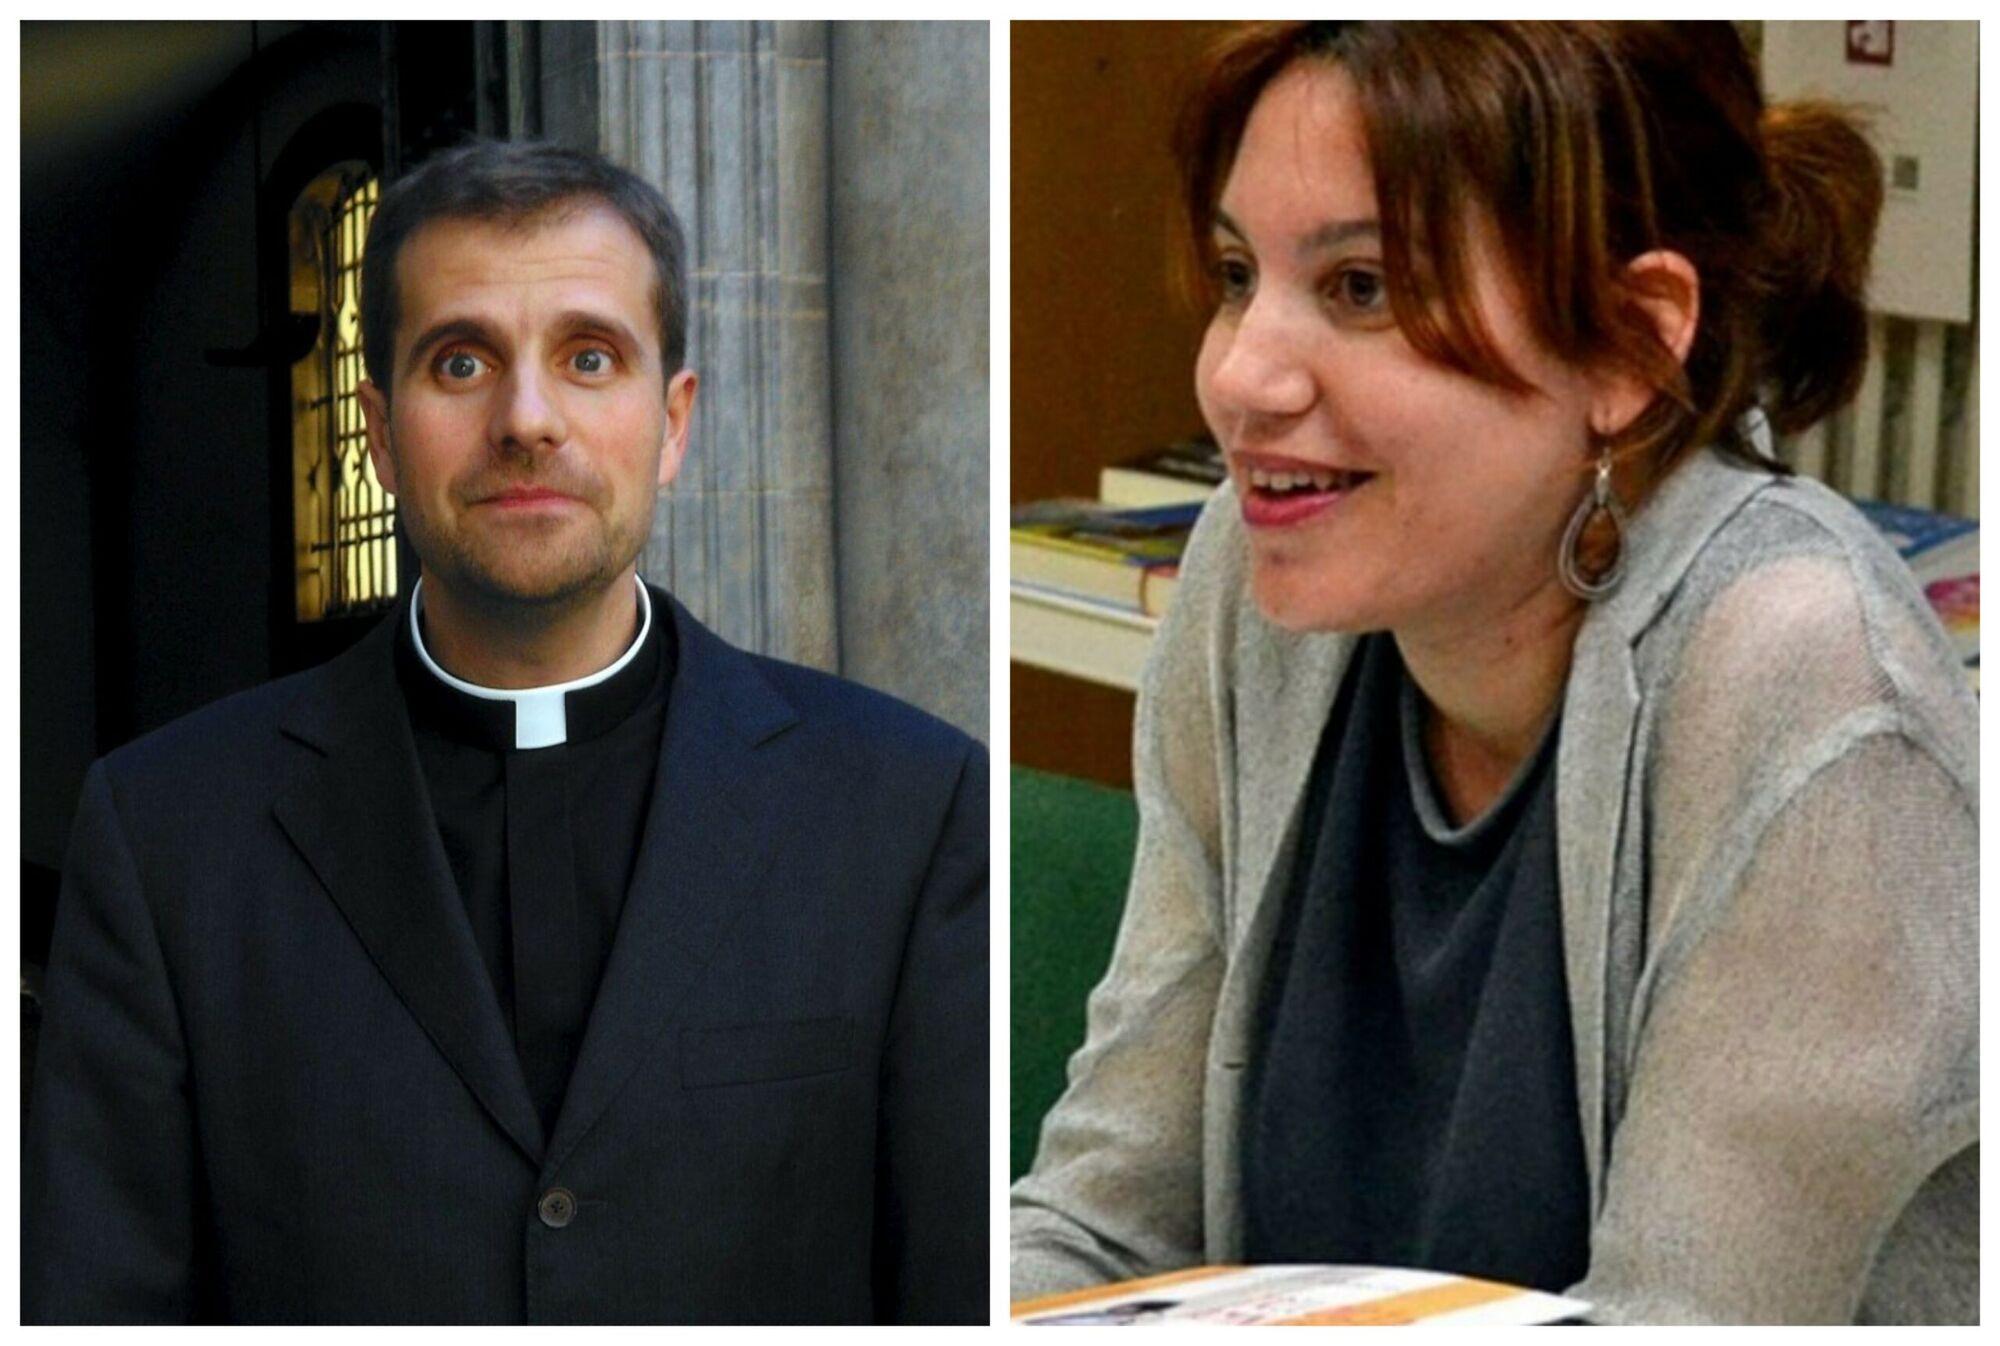 Єпископ Ксав'є Новел закохався в письменницю-сатаністку Сільвію Кабальол